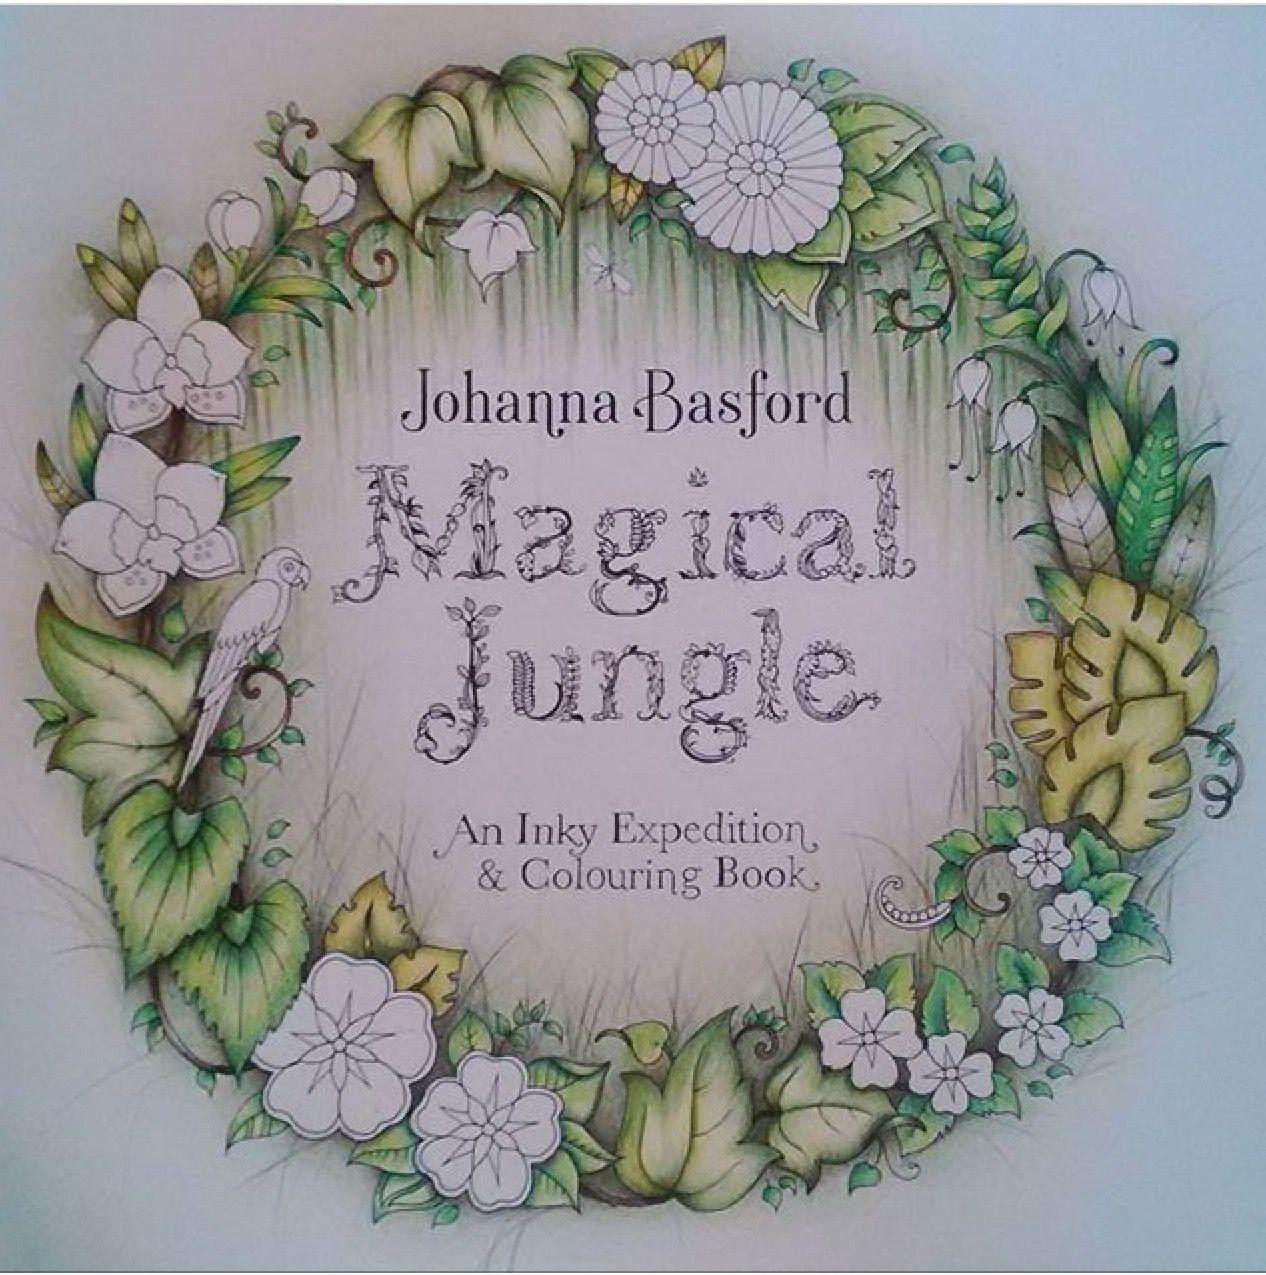 Magical Jungle Title Page Coloring BooksAdult ColoringCommentJohanna BasfordInstagramPrismacolorPencil